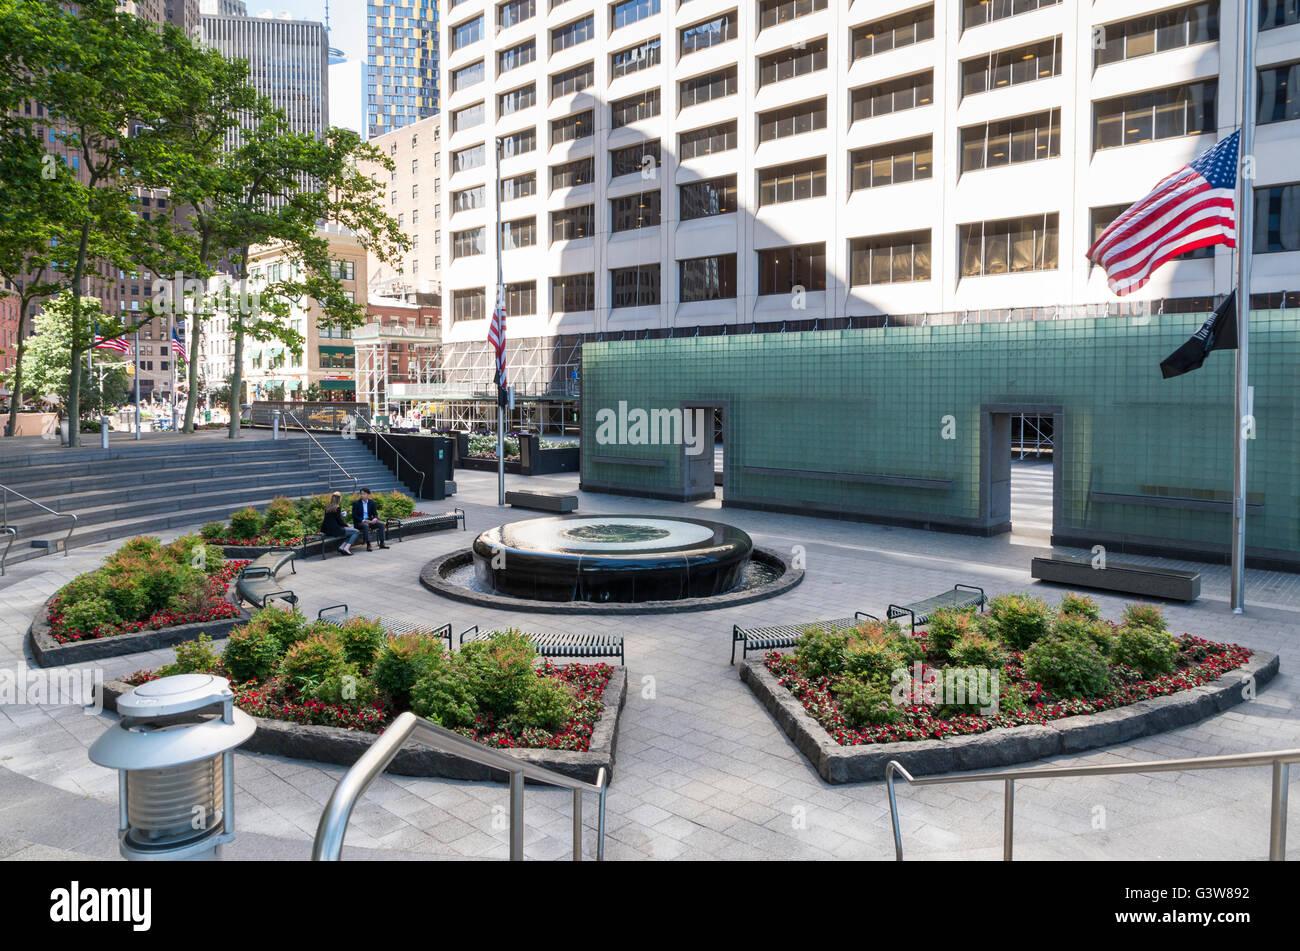 Vietnam Veteran's Memorial Plaza, New York - Stock Image